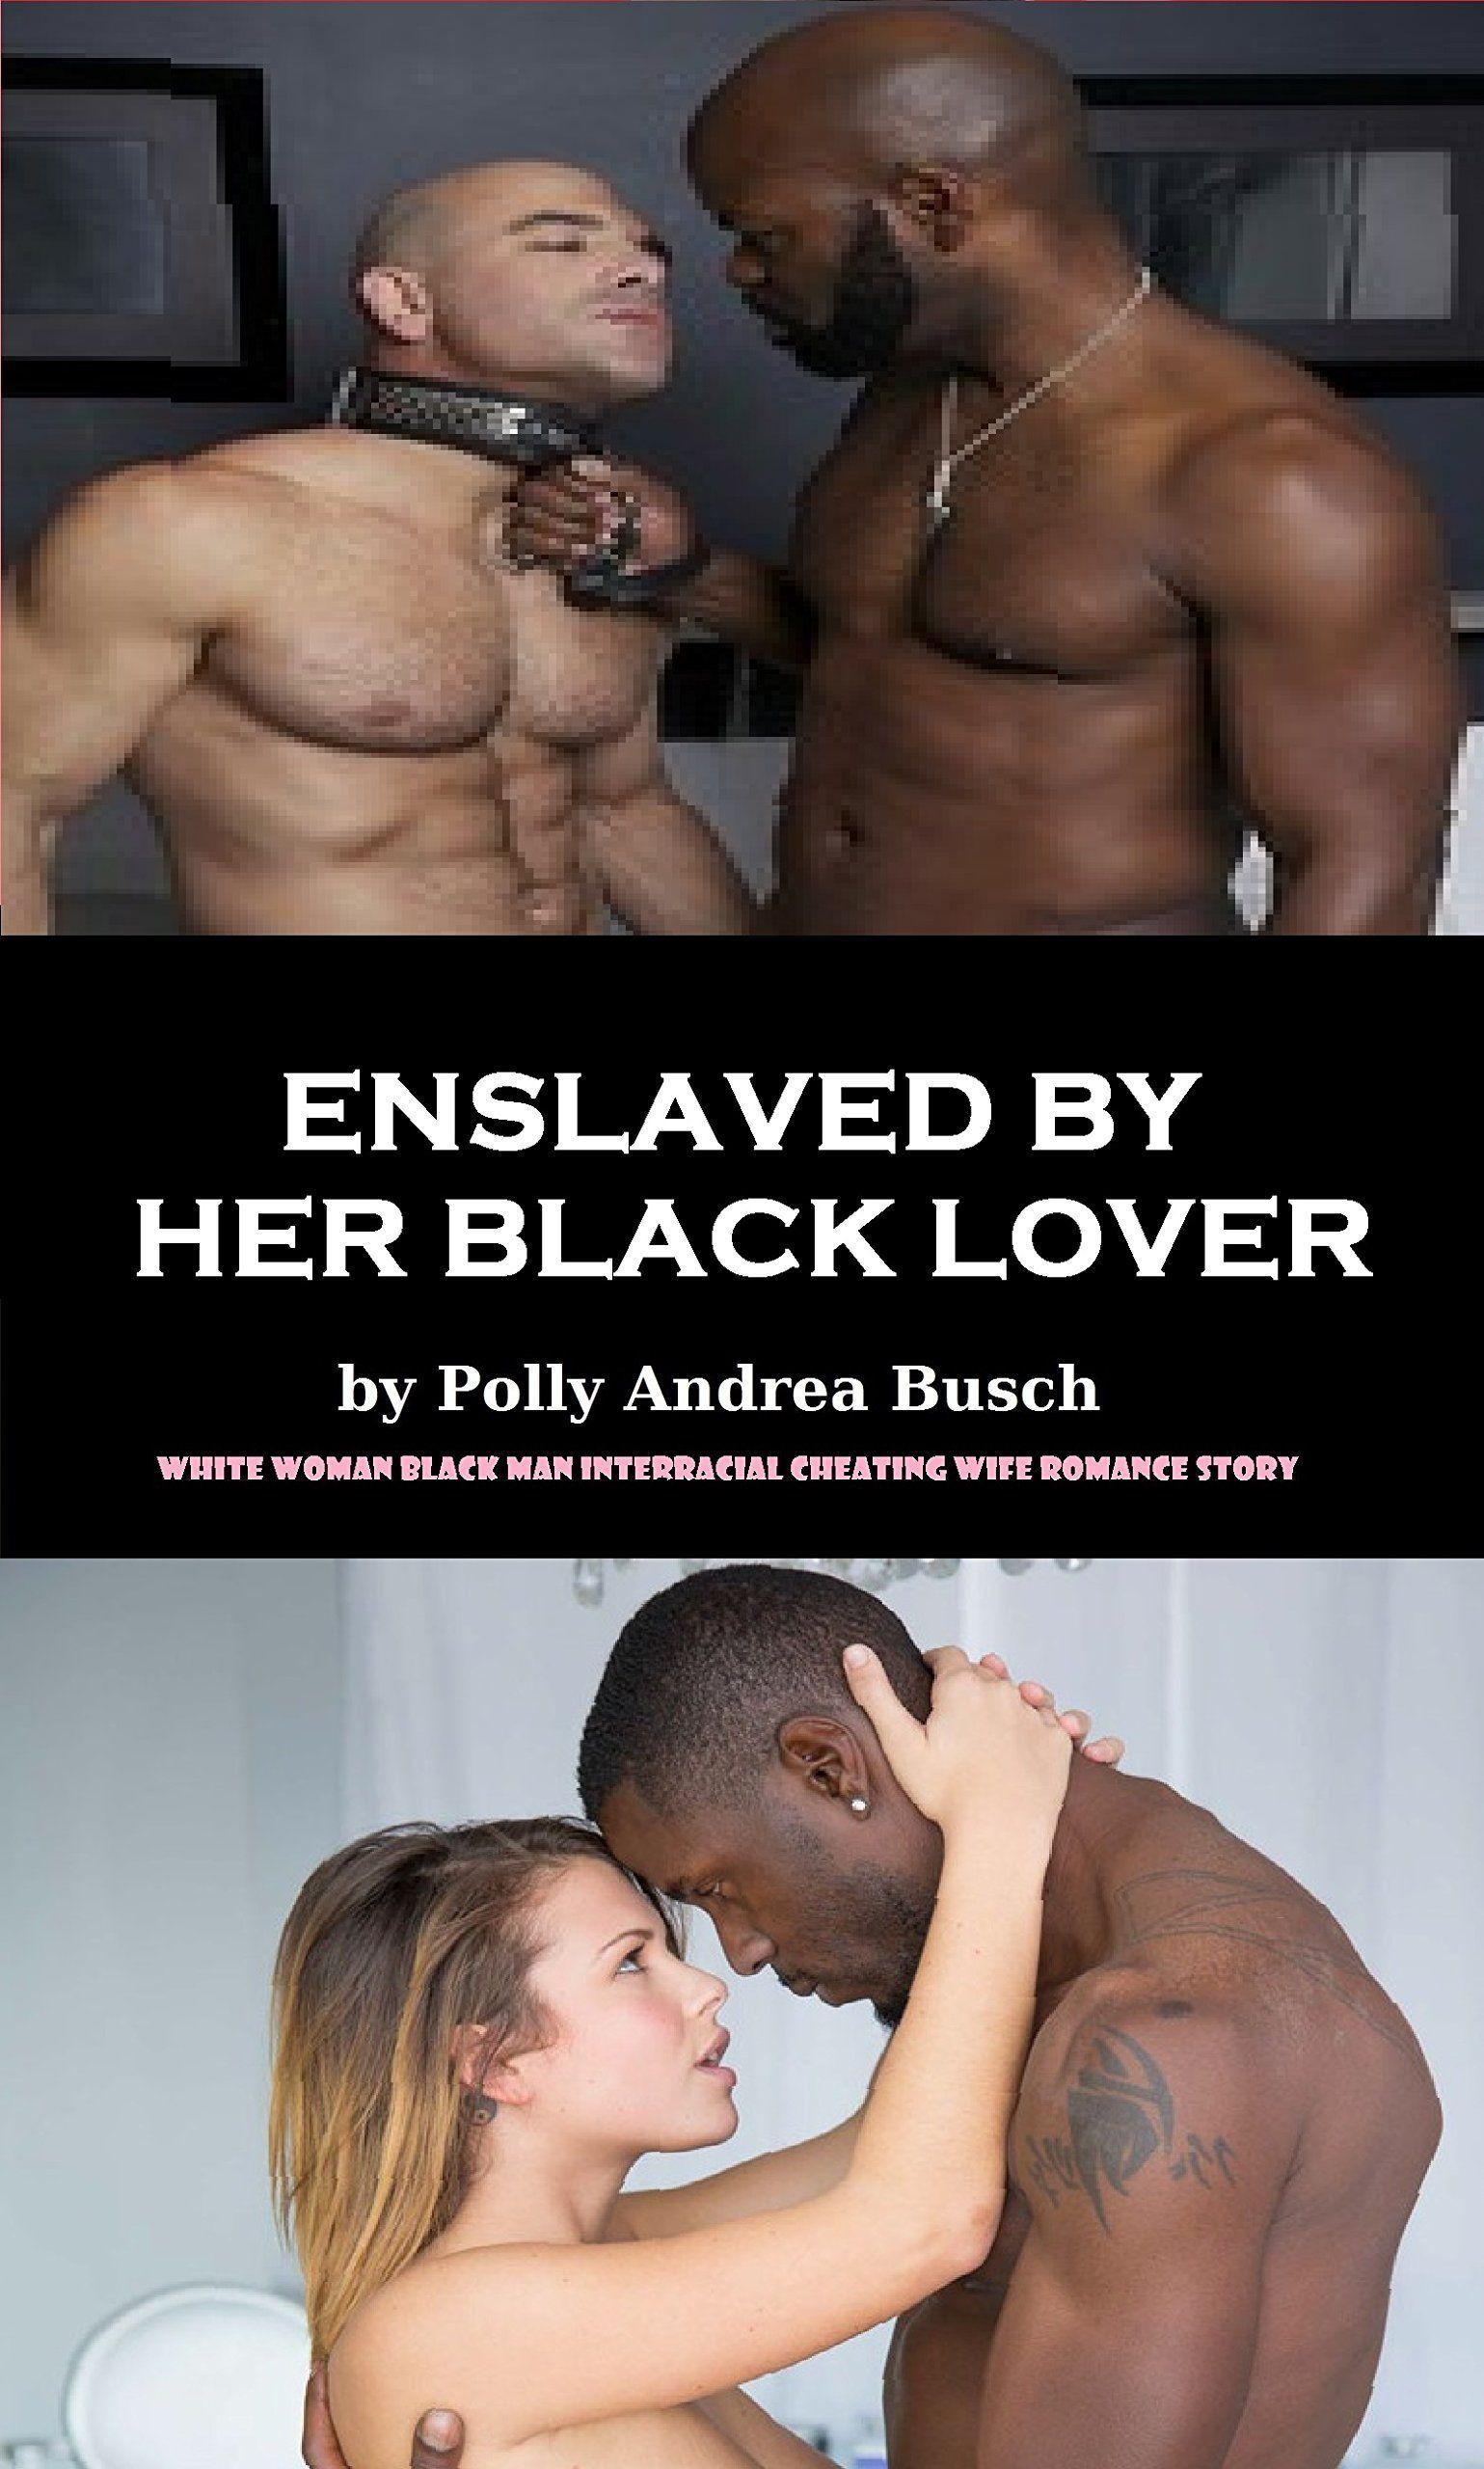 Free Interracial Cheating Wife Story Porn Videos - Pornhub.